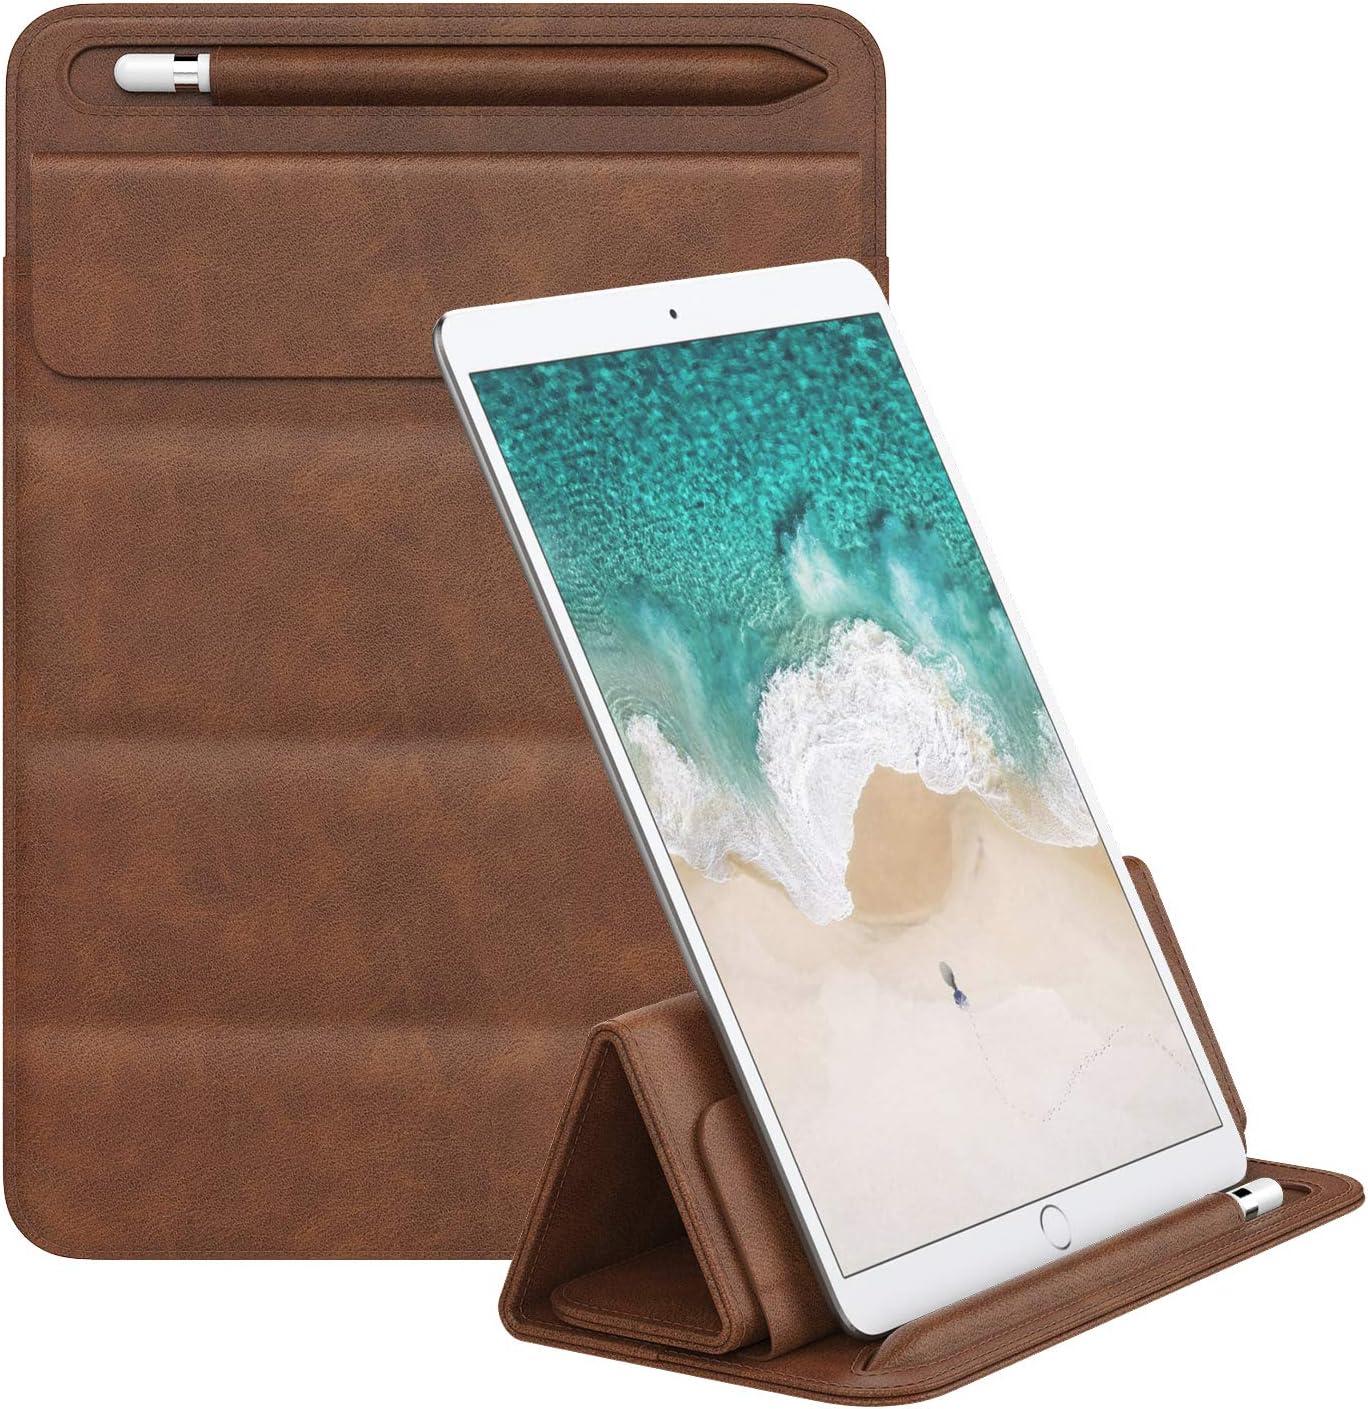 iPad Air 3 10.5 iPad Pro 10.5//9.7 Inch iPad Air 2 MoKo 9-11 Inch iPad Sleeve Case iPad 9.7 6th Generation iPad Pro 11 PU Leather Trifold Stand Case with Pen Holder Fits iPad 10.2 2019 Brown